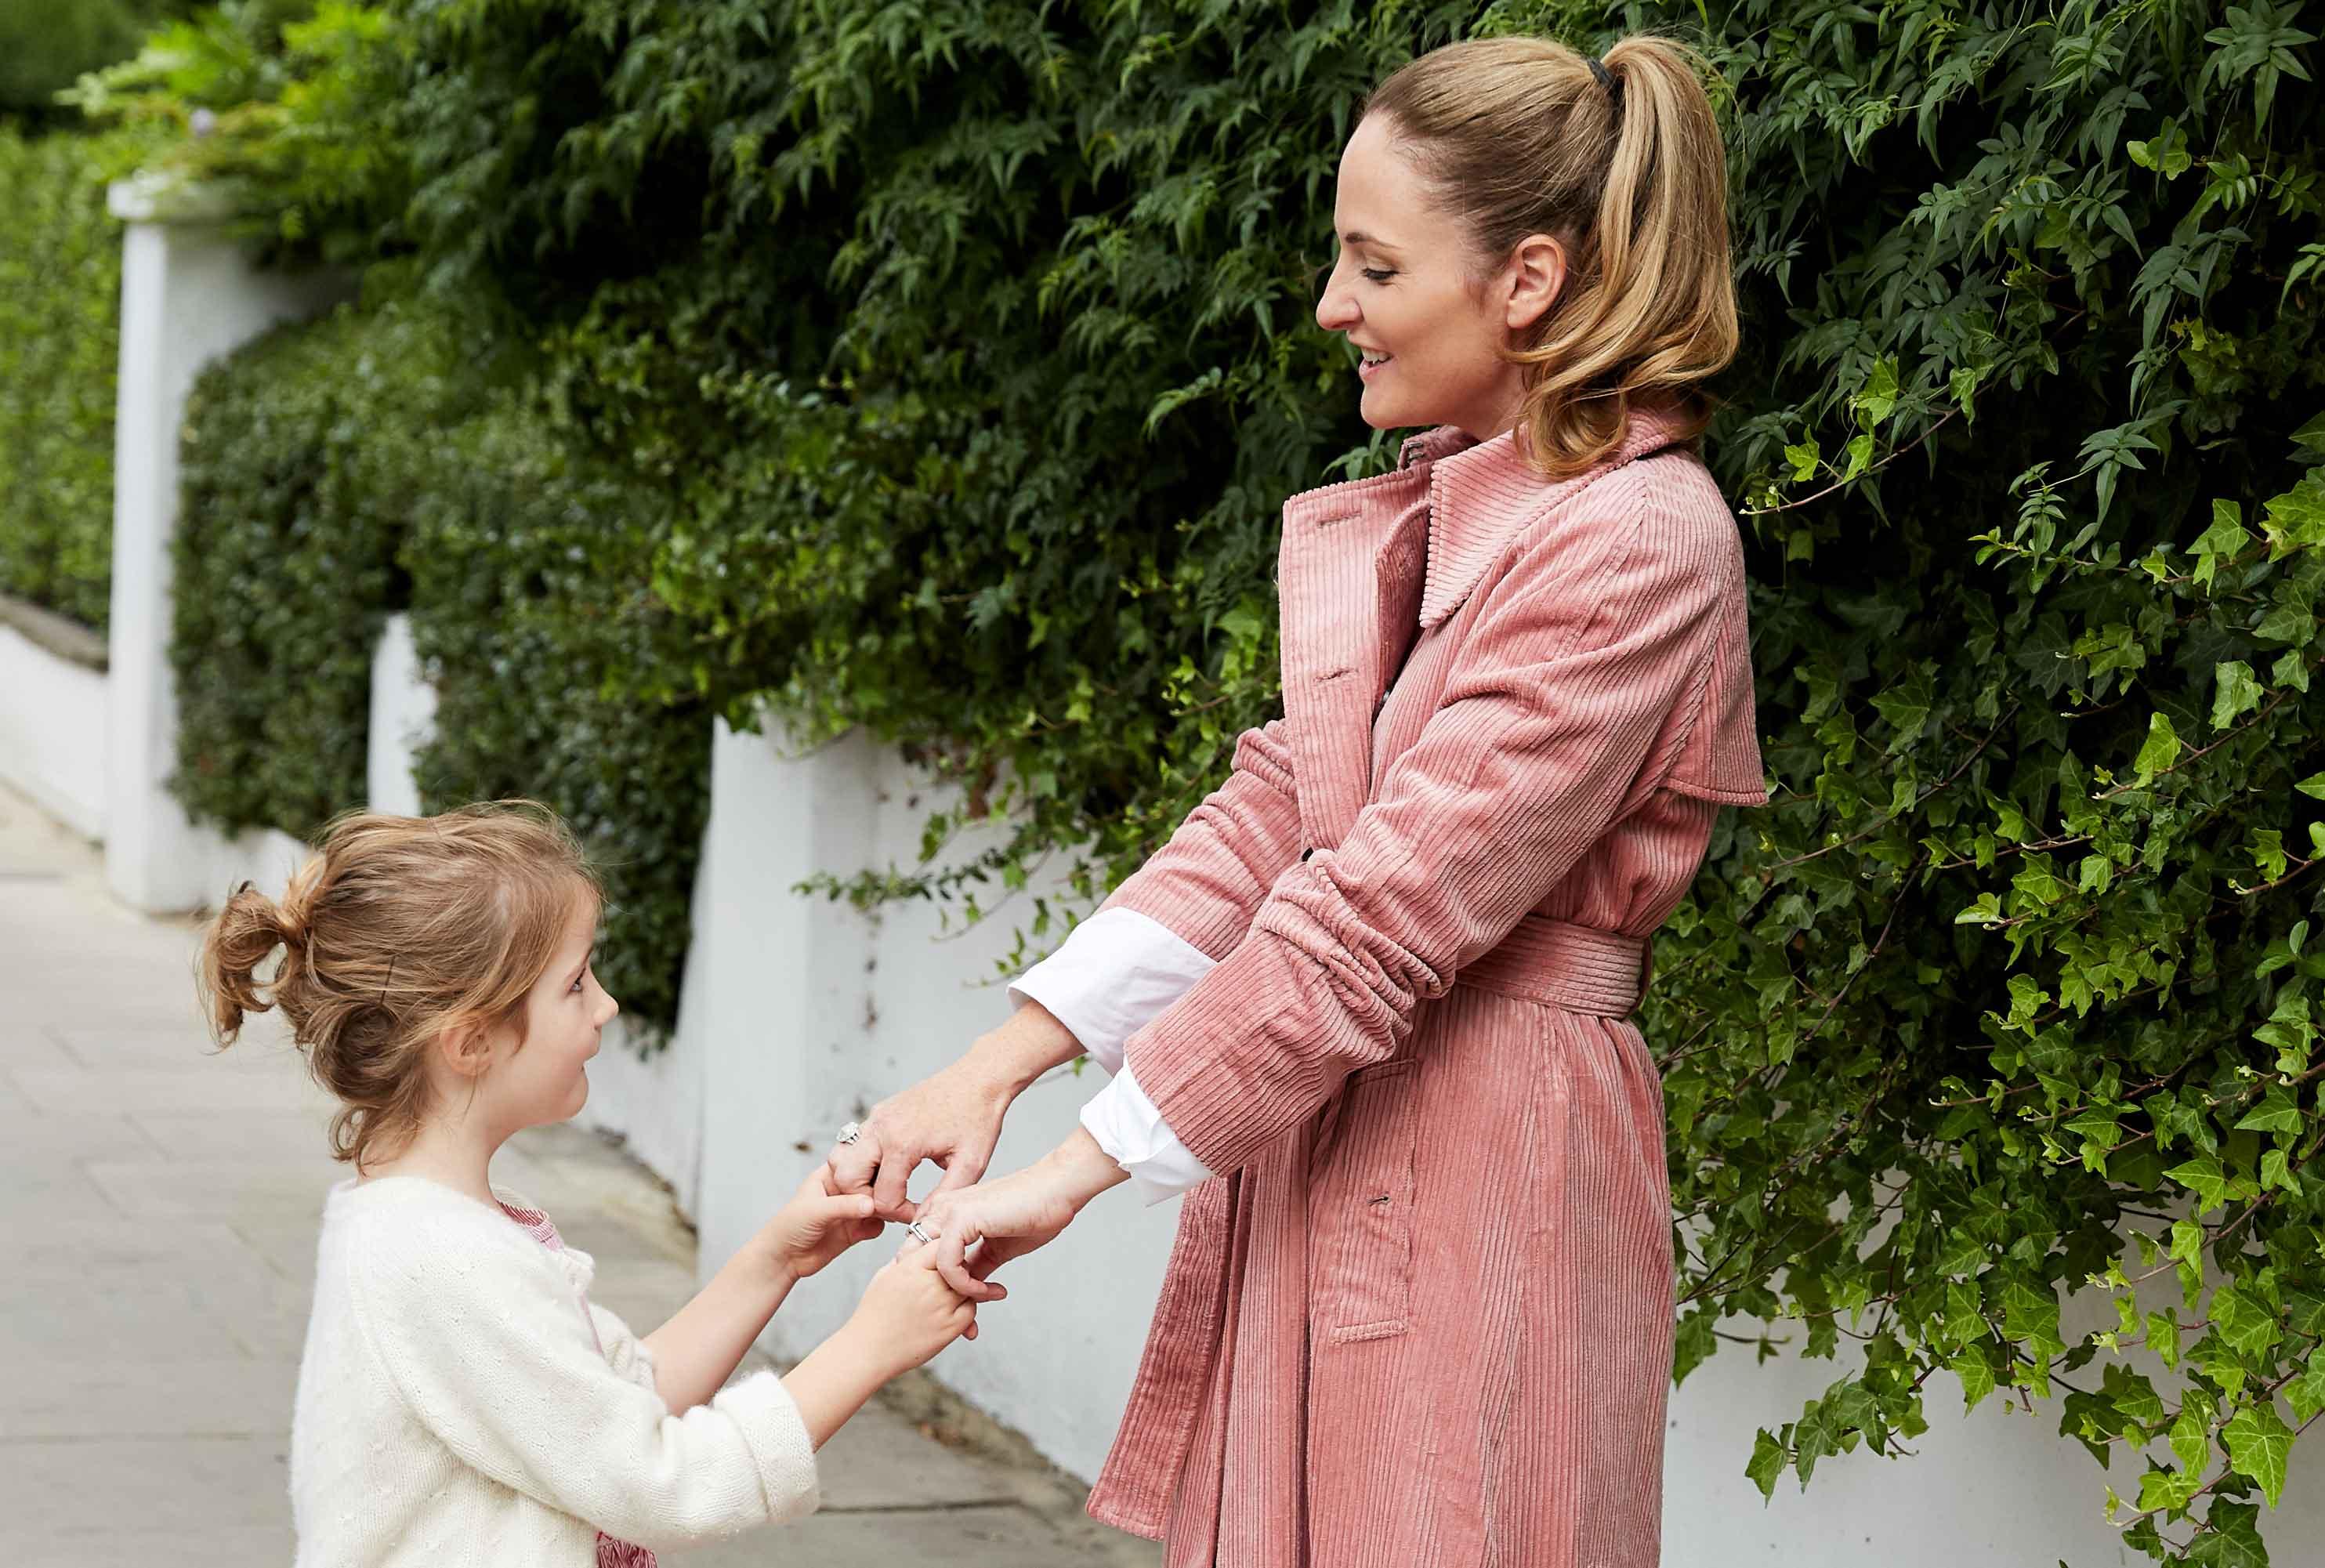 Parenting Guru Ann Pleshette Murphy On How To Unspoil Your Child